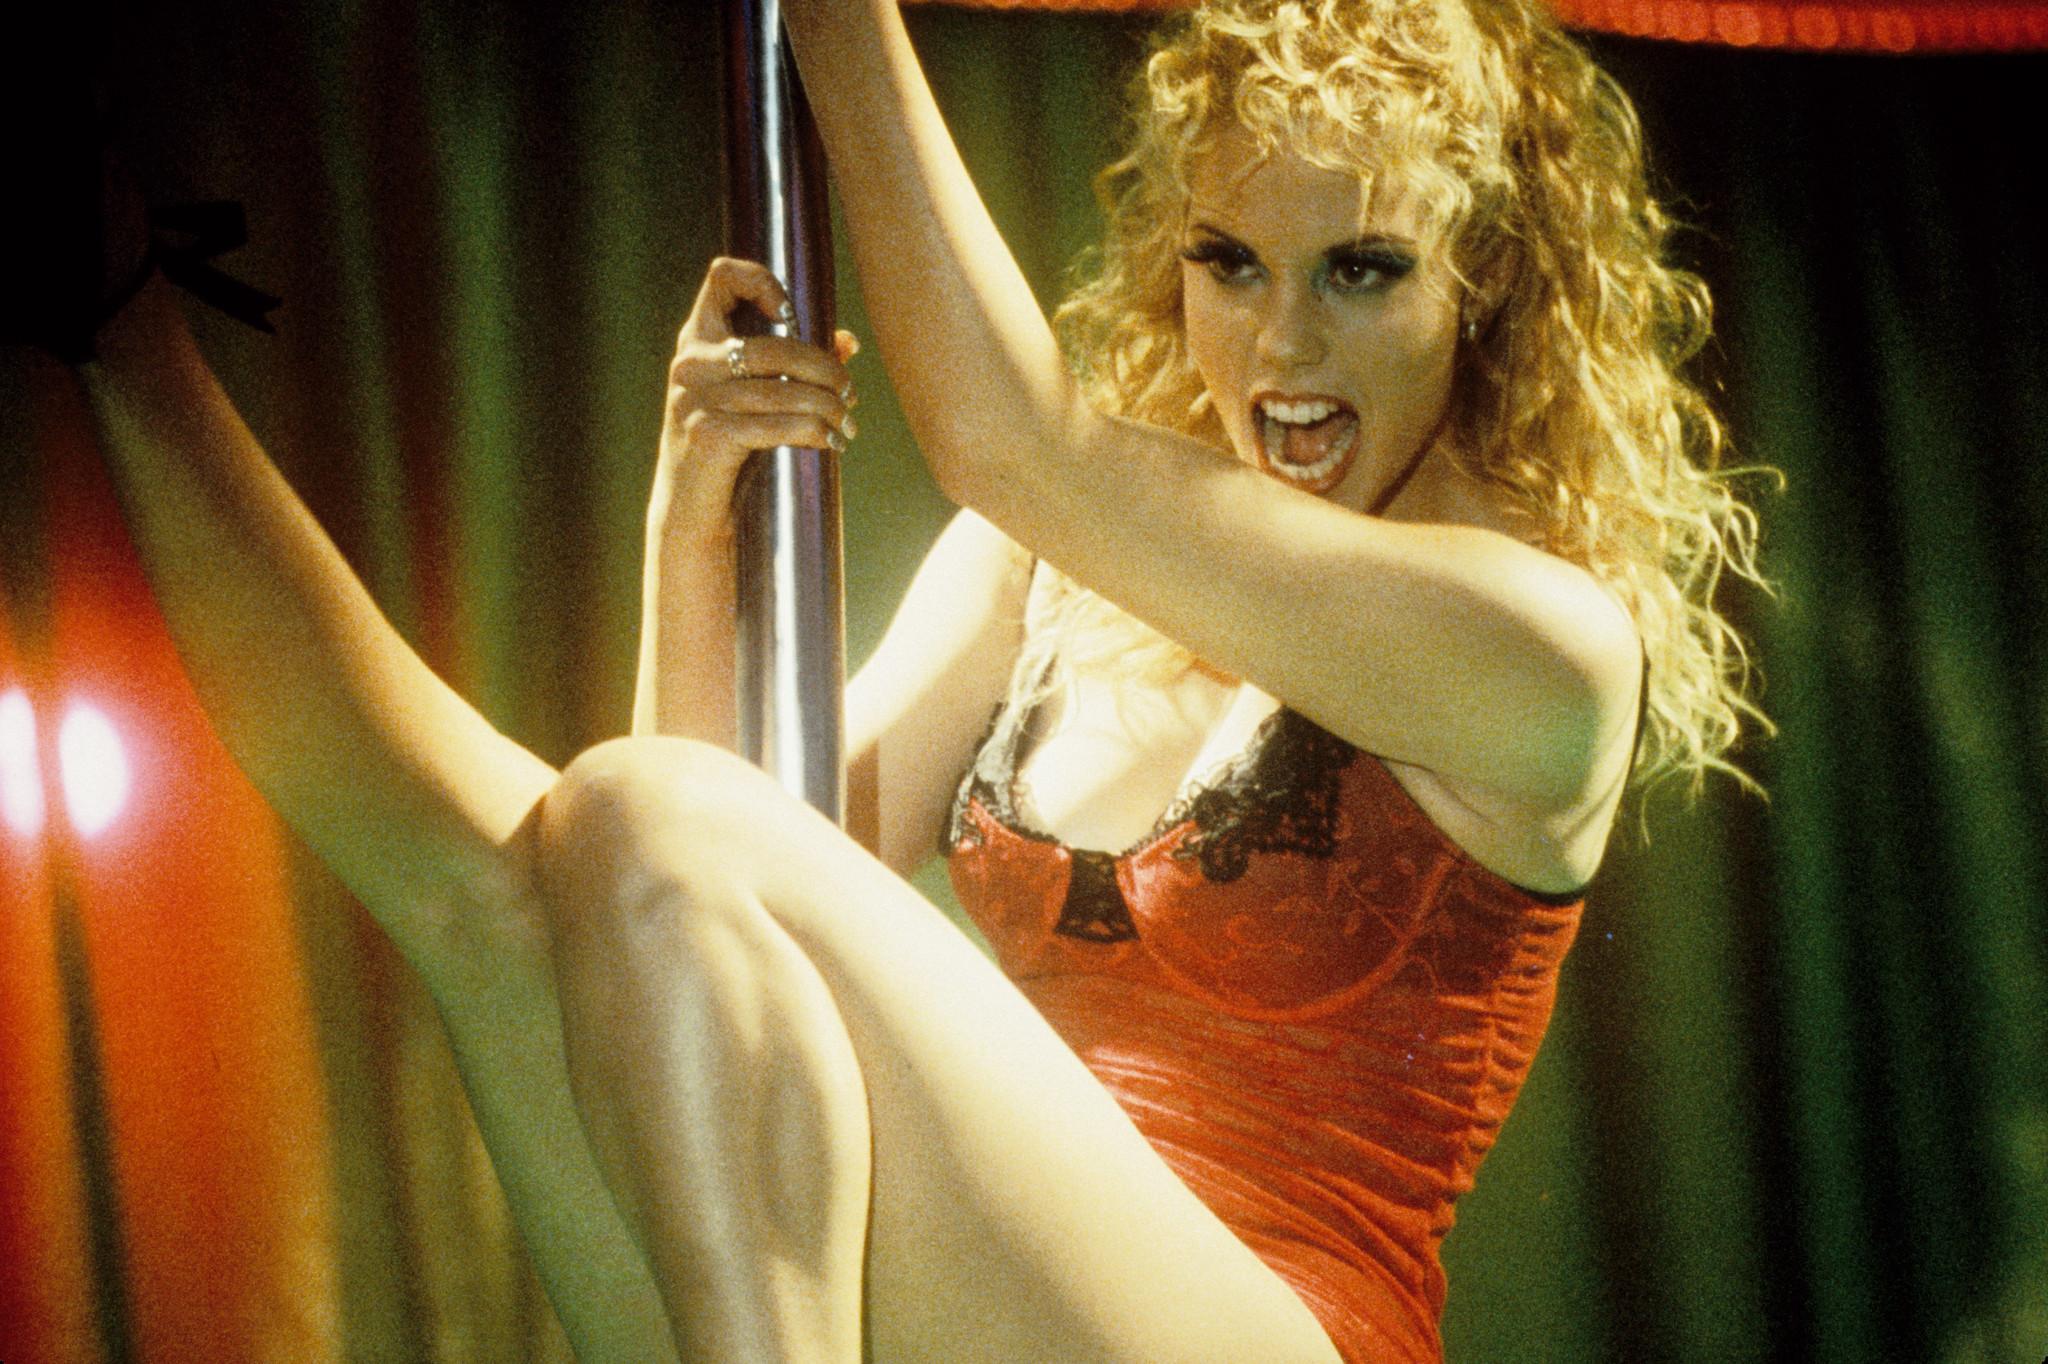 0802180152727_00_Elizabeth Berkley in Showgirls (1995).jpg